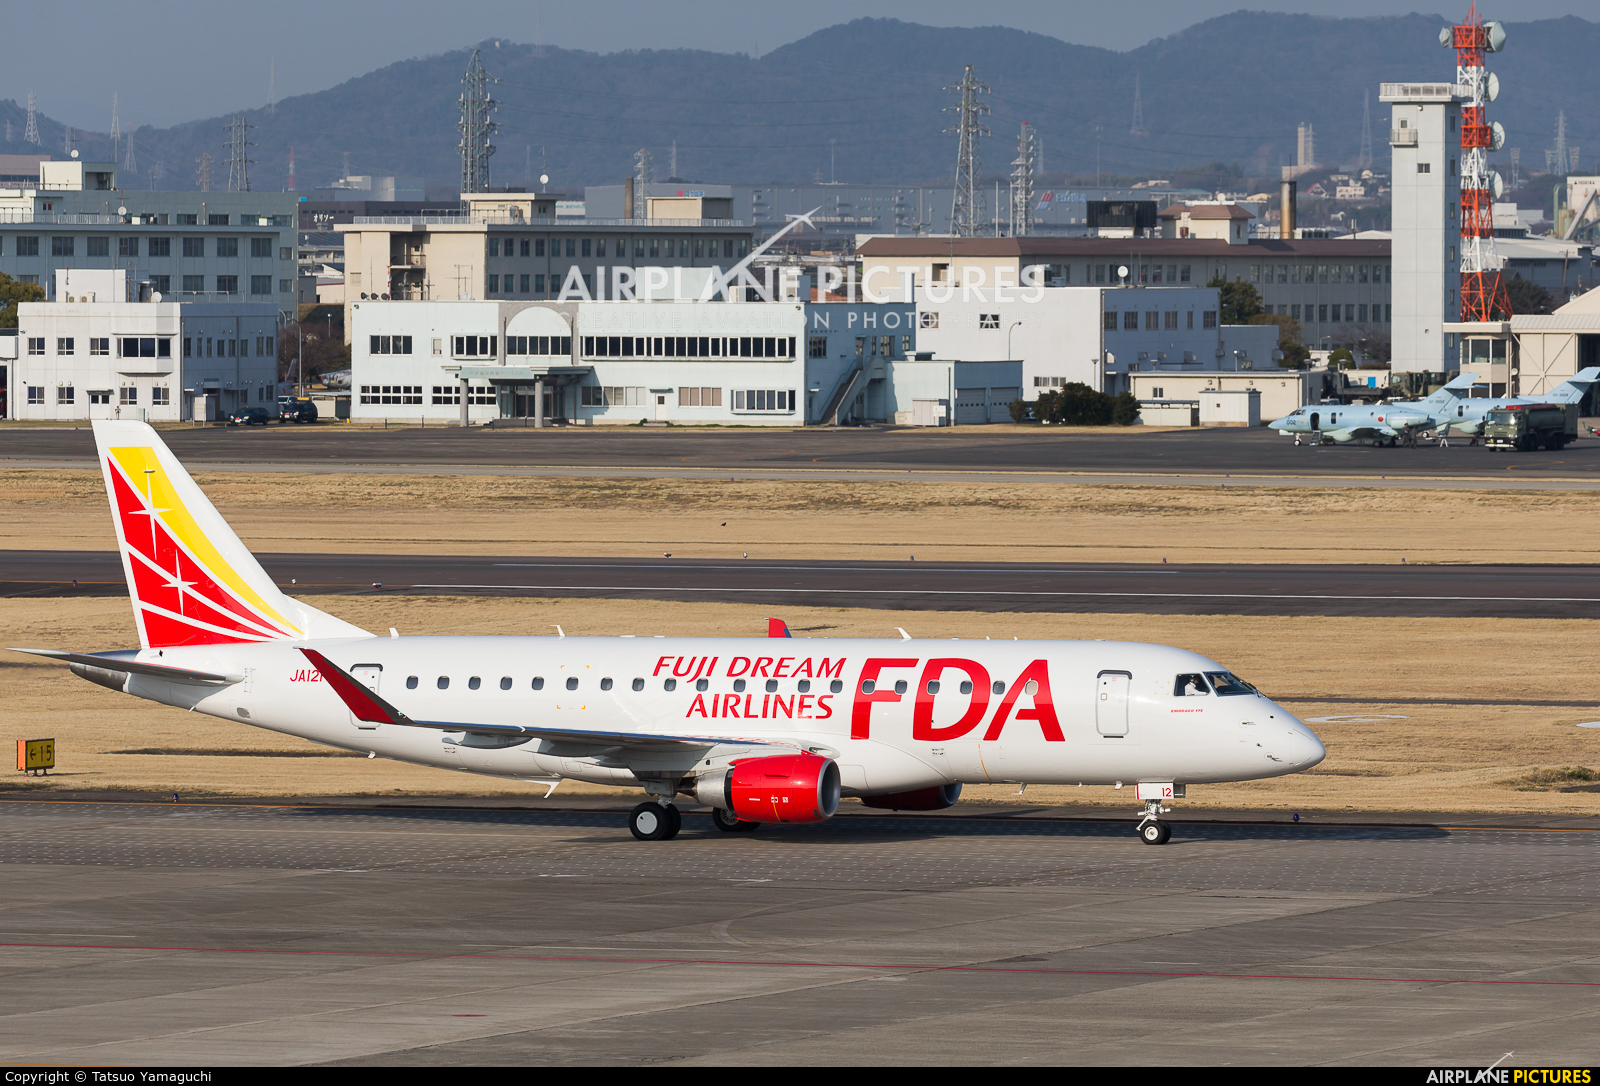 Fuji Dream Airlines JA12FJ aircraft at Nagoya - Komaki AB